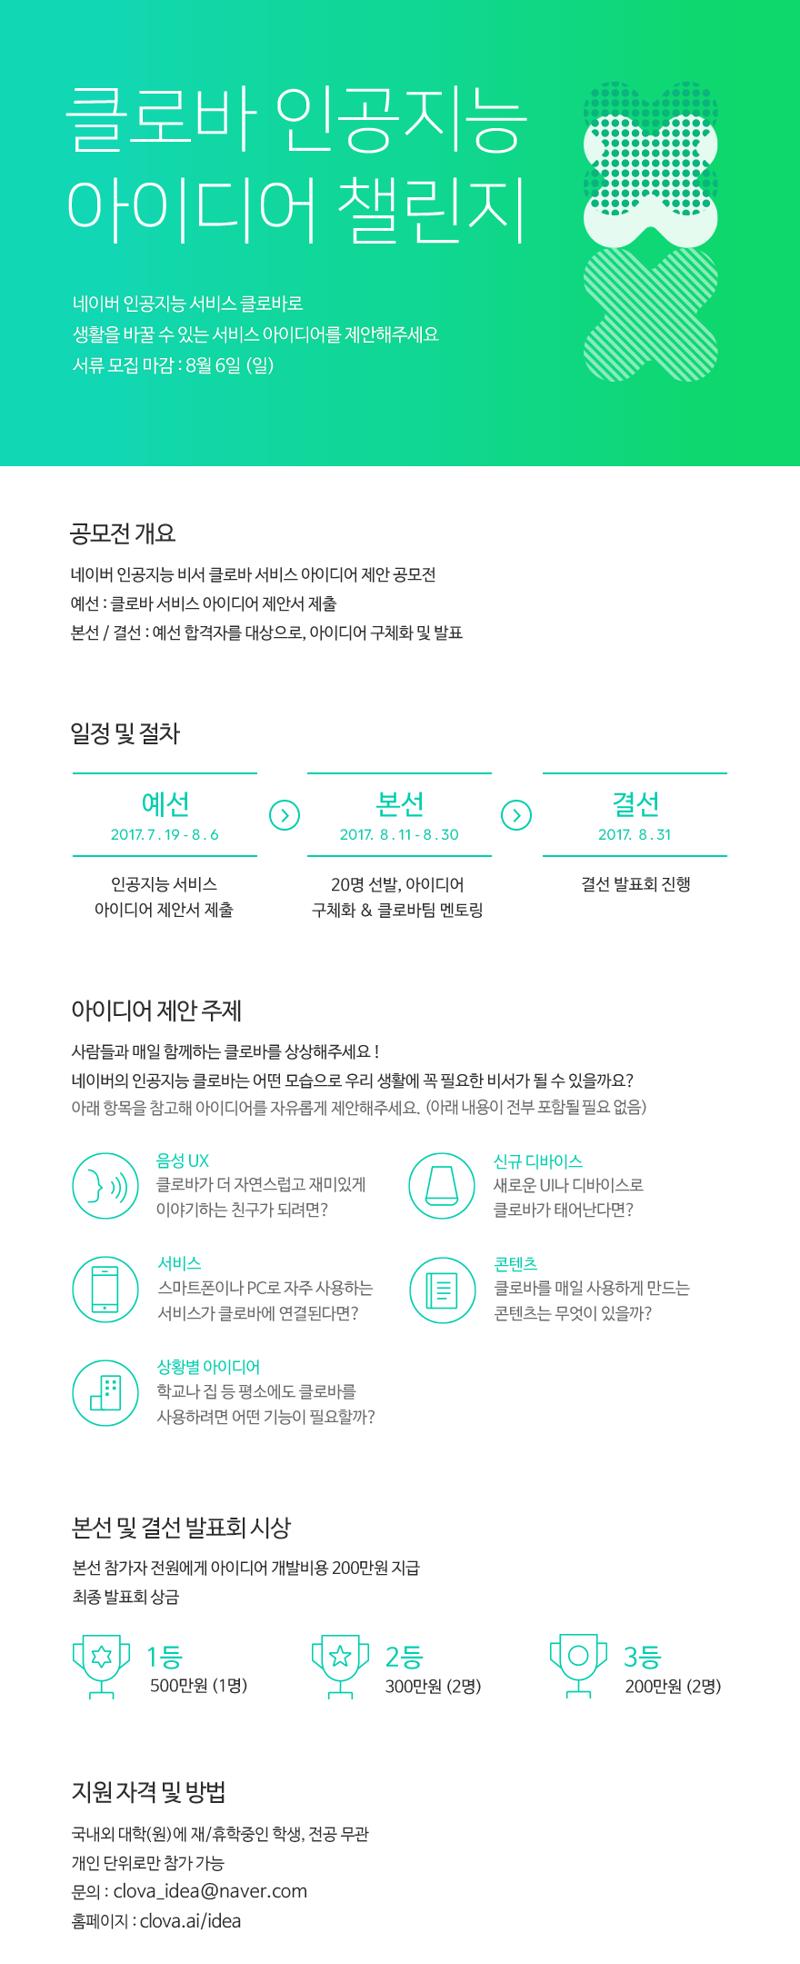 [NAVER](수정) 네이버 클로바 인공지능 아이디어 챌린지 안내.png